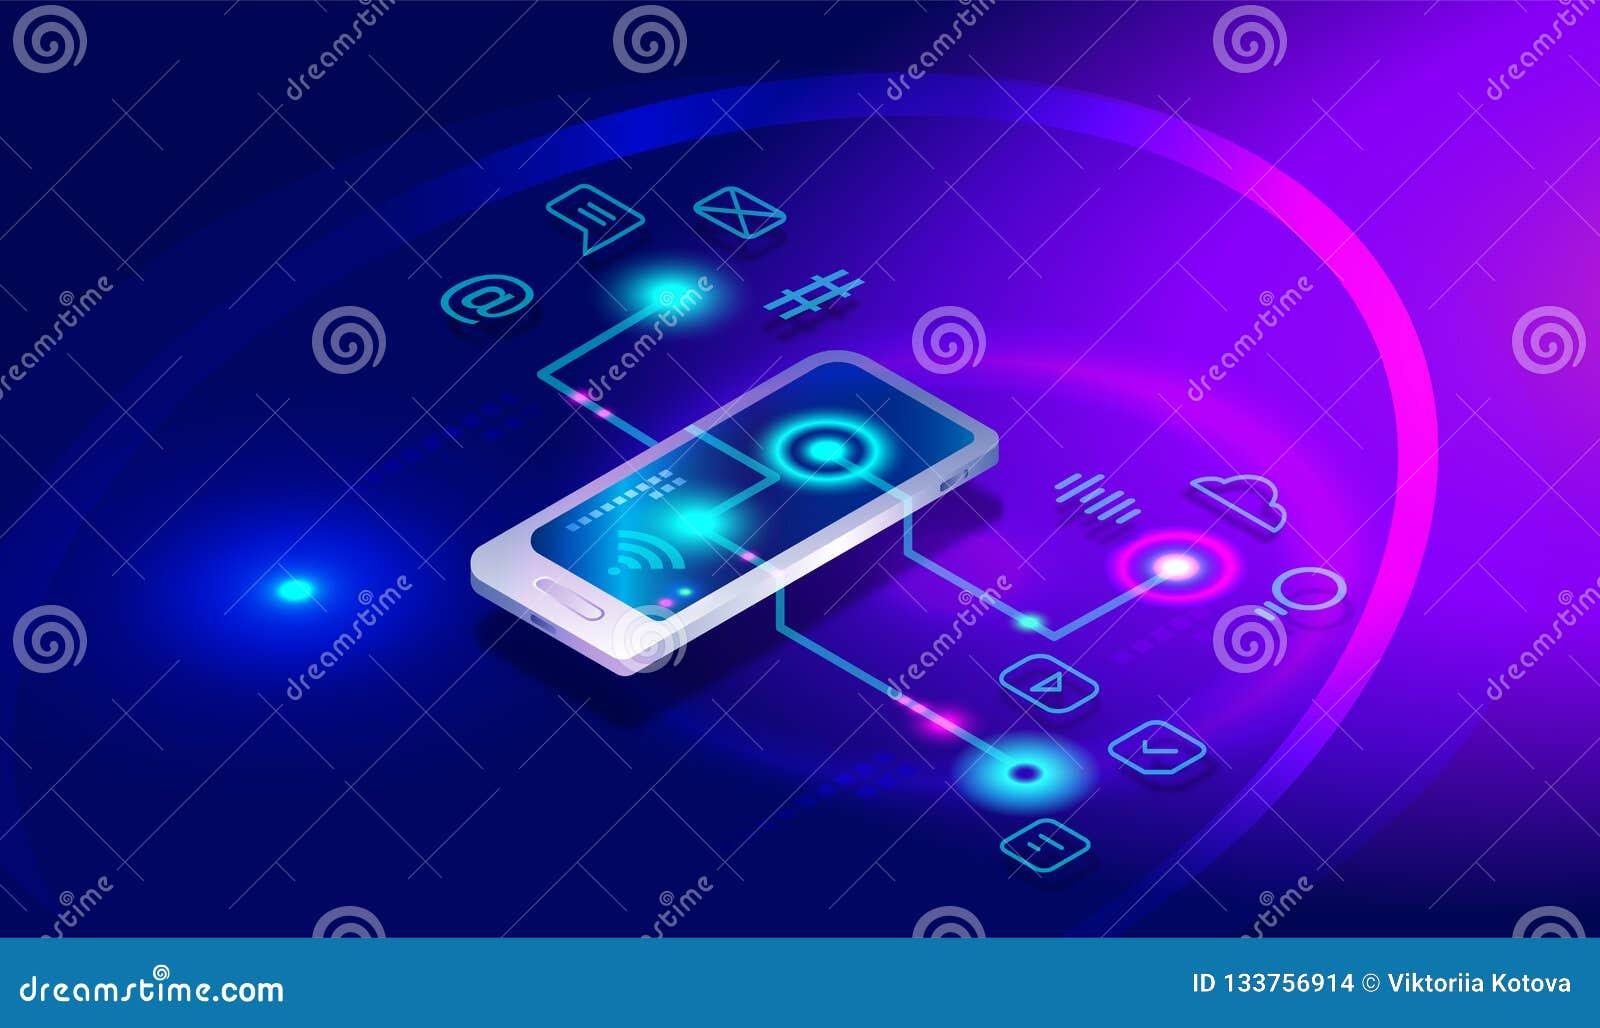 Isometric smartphone με διαφορετικές εφαρμογές, apps, σε απευθείας σύνδεση υπηρεσίες, λογισμικό Isometric smartphone, κινητό τηλέ